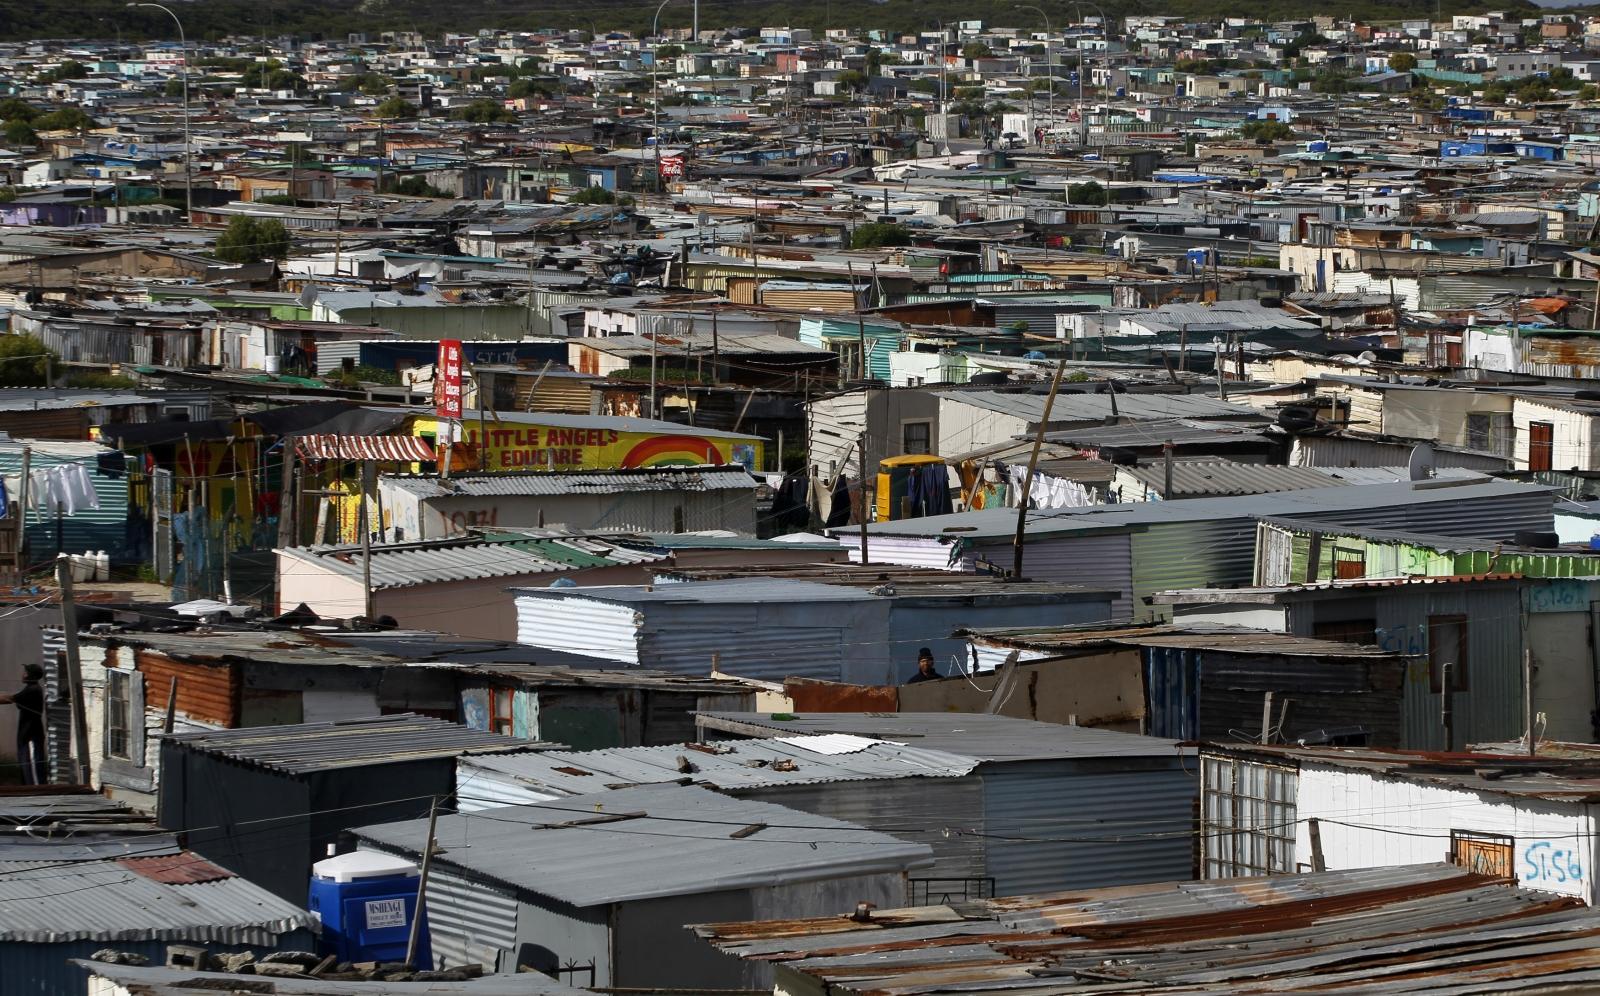 Cape Town's crime-ridden Khayelitsha township